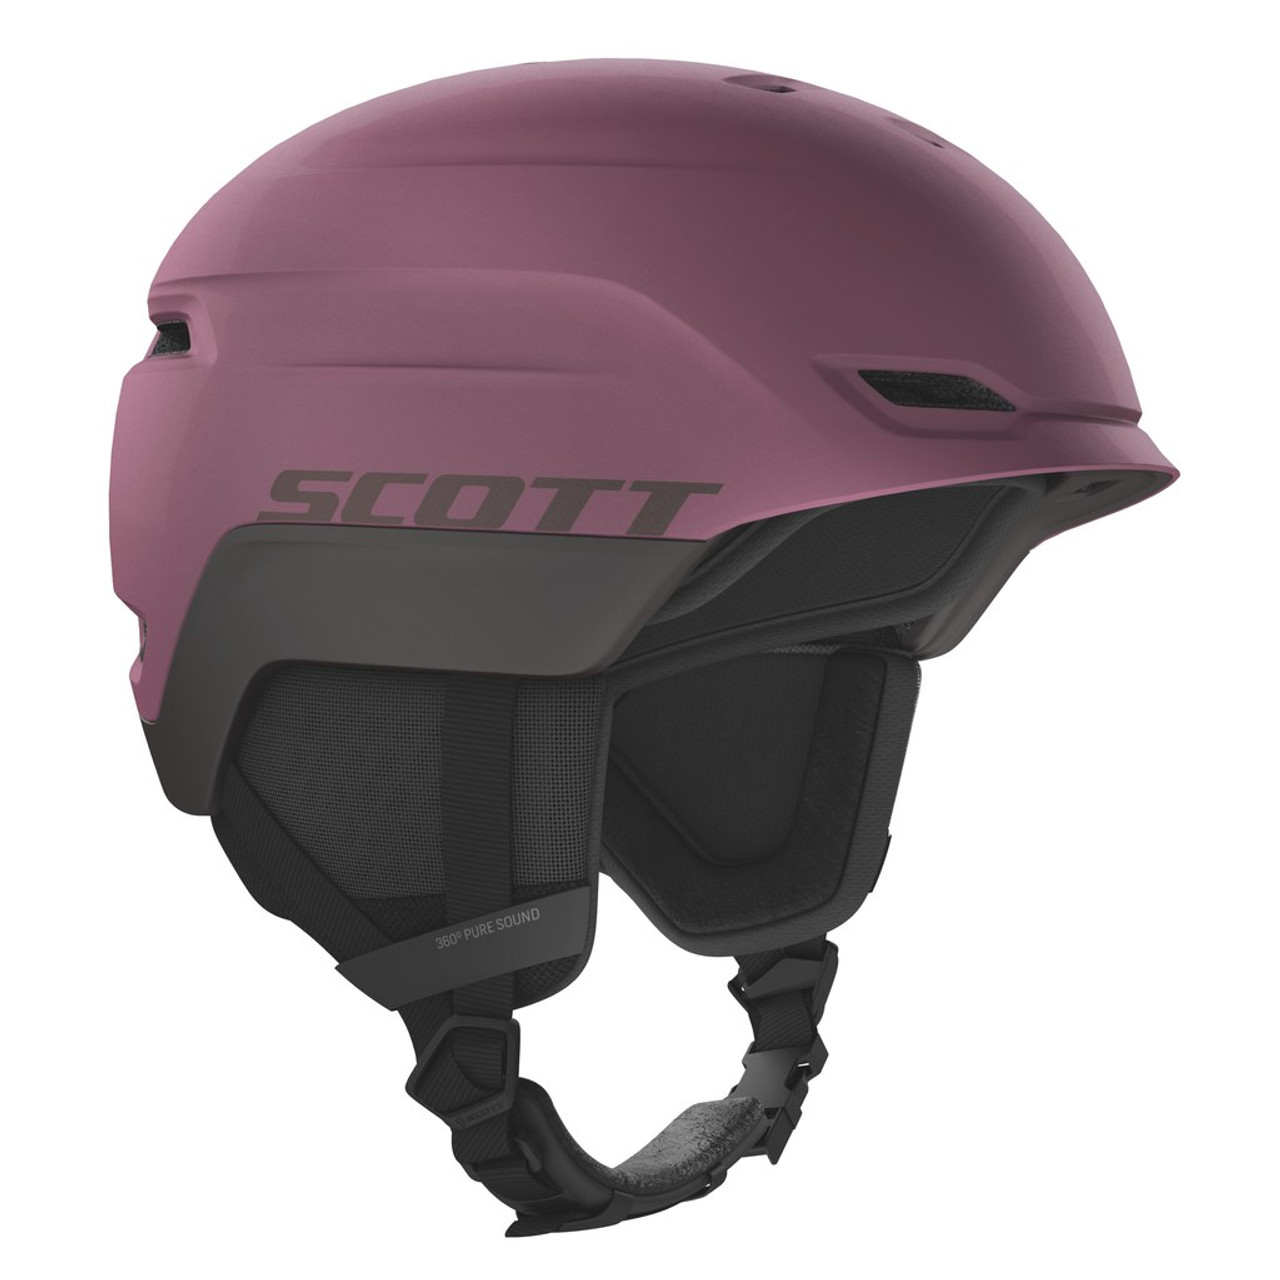 Cassis Pink/Red Fudge - Scott Chase 2 PLUS Helmet